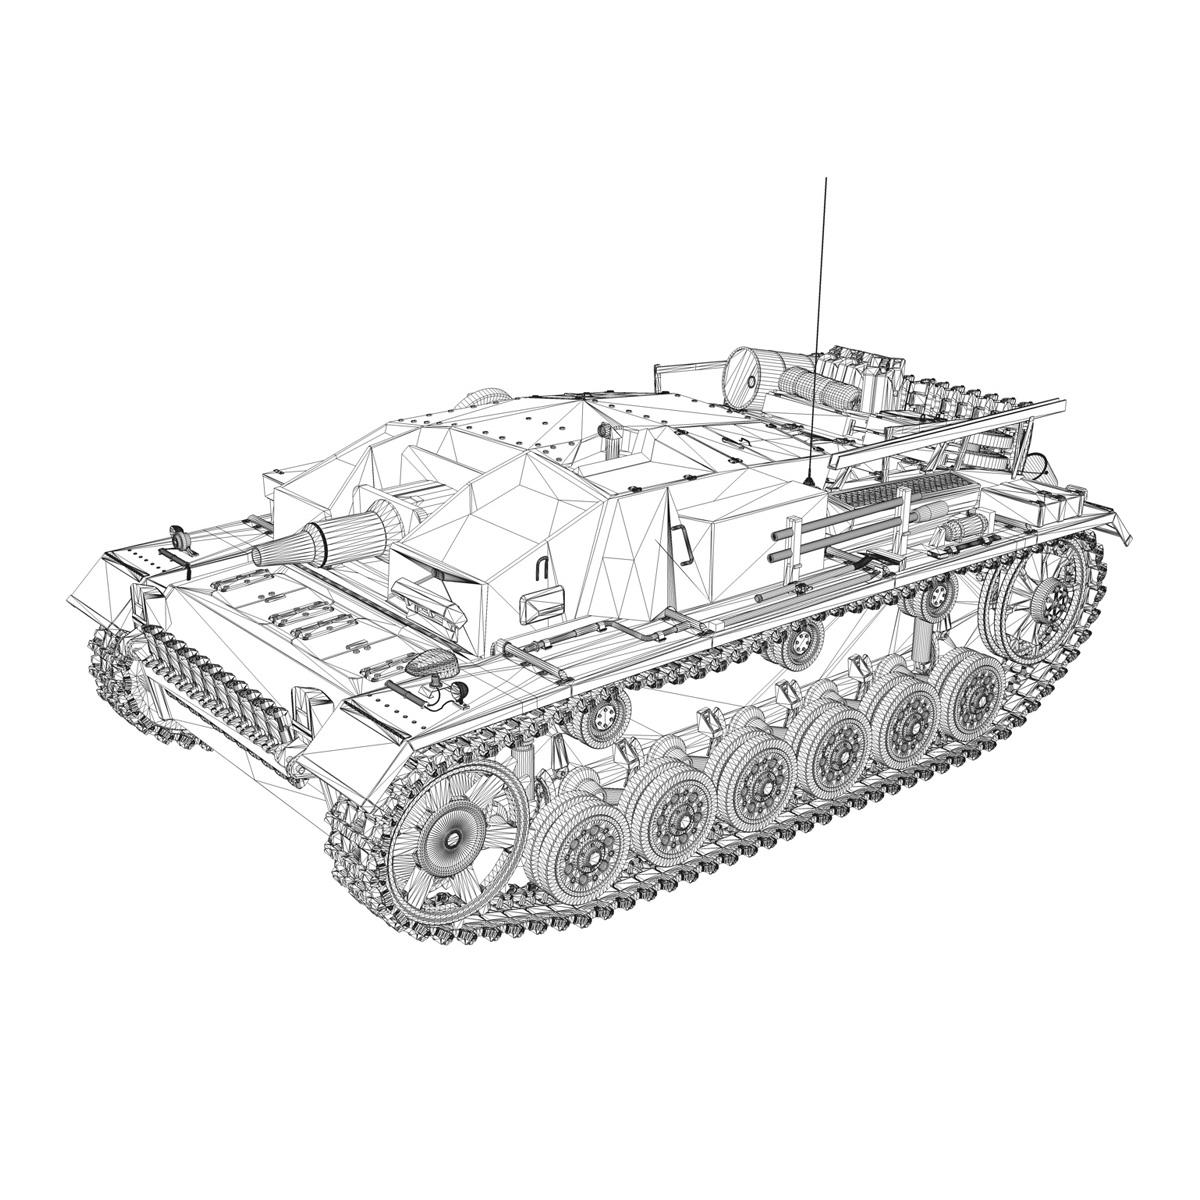 stug iii – ausf.d – stug abt 192 – winter camo 3d model 3ds fbx lwo lw lws obj c4d 265233